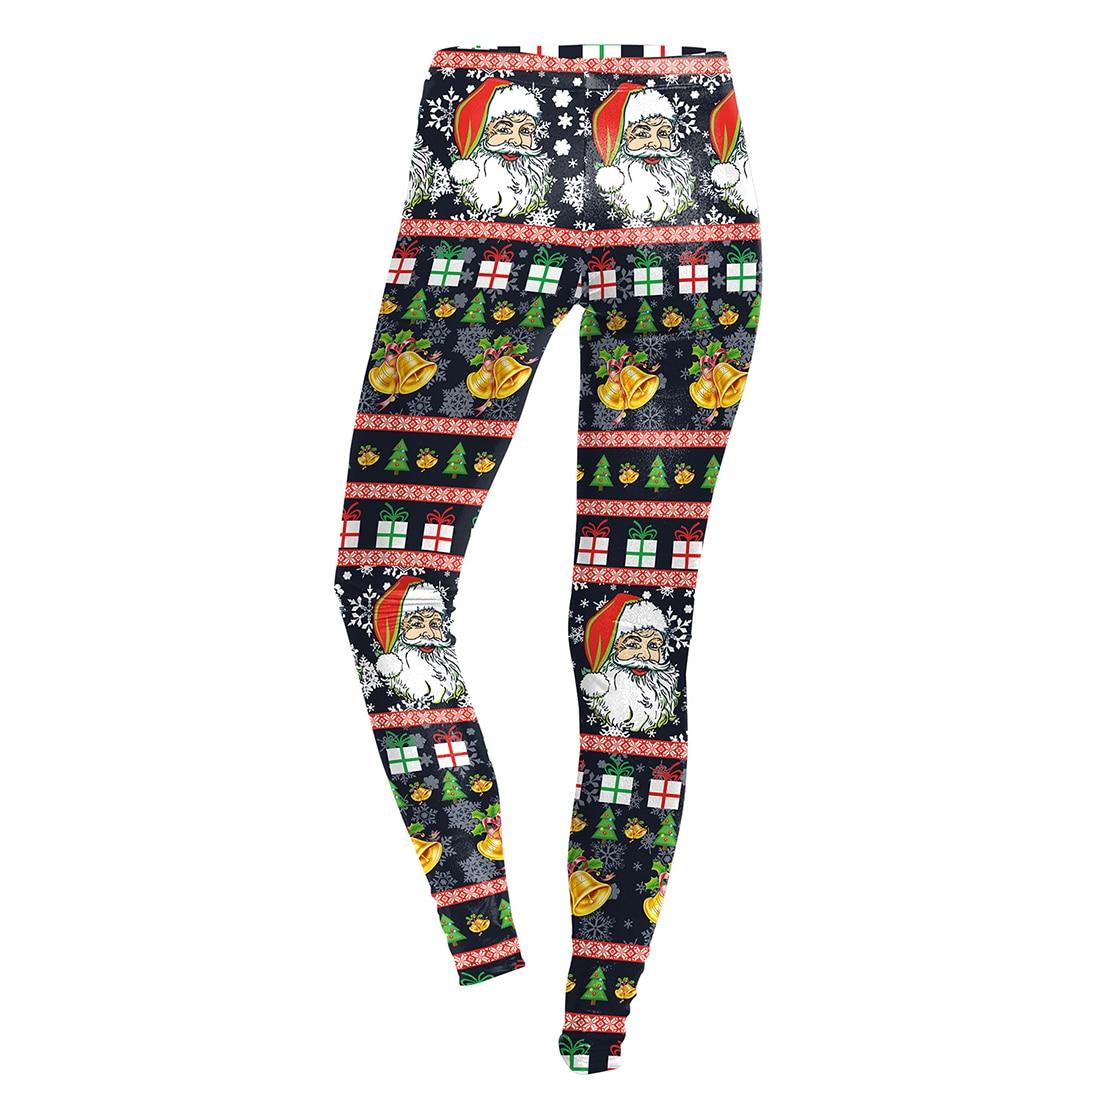 Marry Christmas Leggings Women Workout Autumn Fitness 3D Print Xmas Leggins Women Santa Claus Pants snowflake Print ...